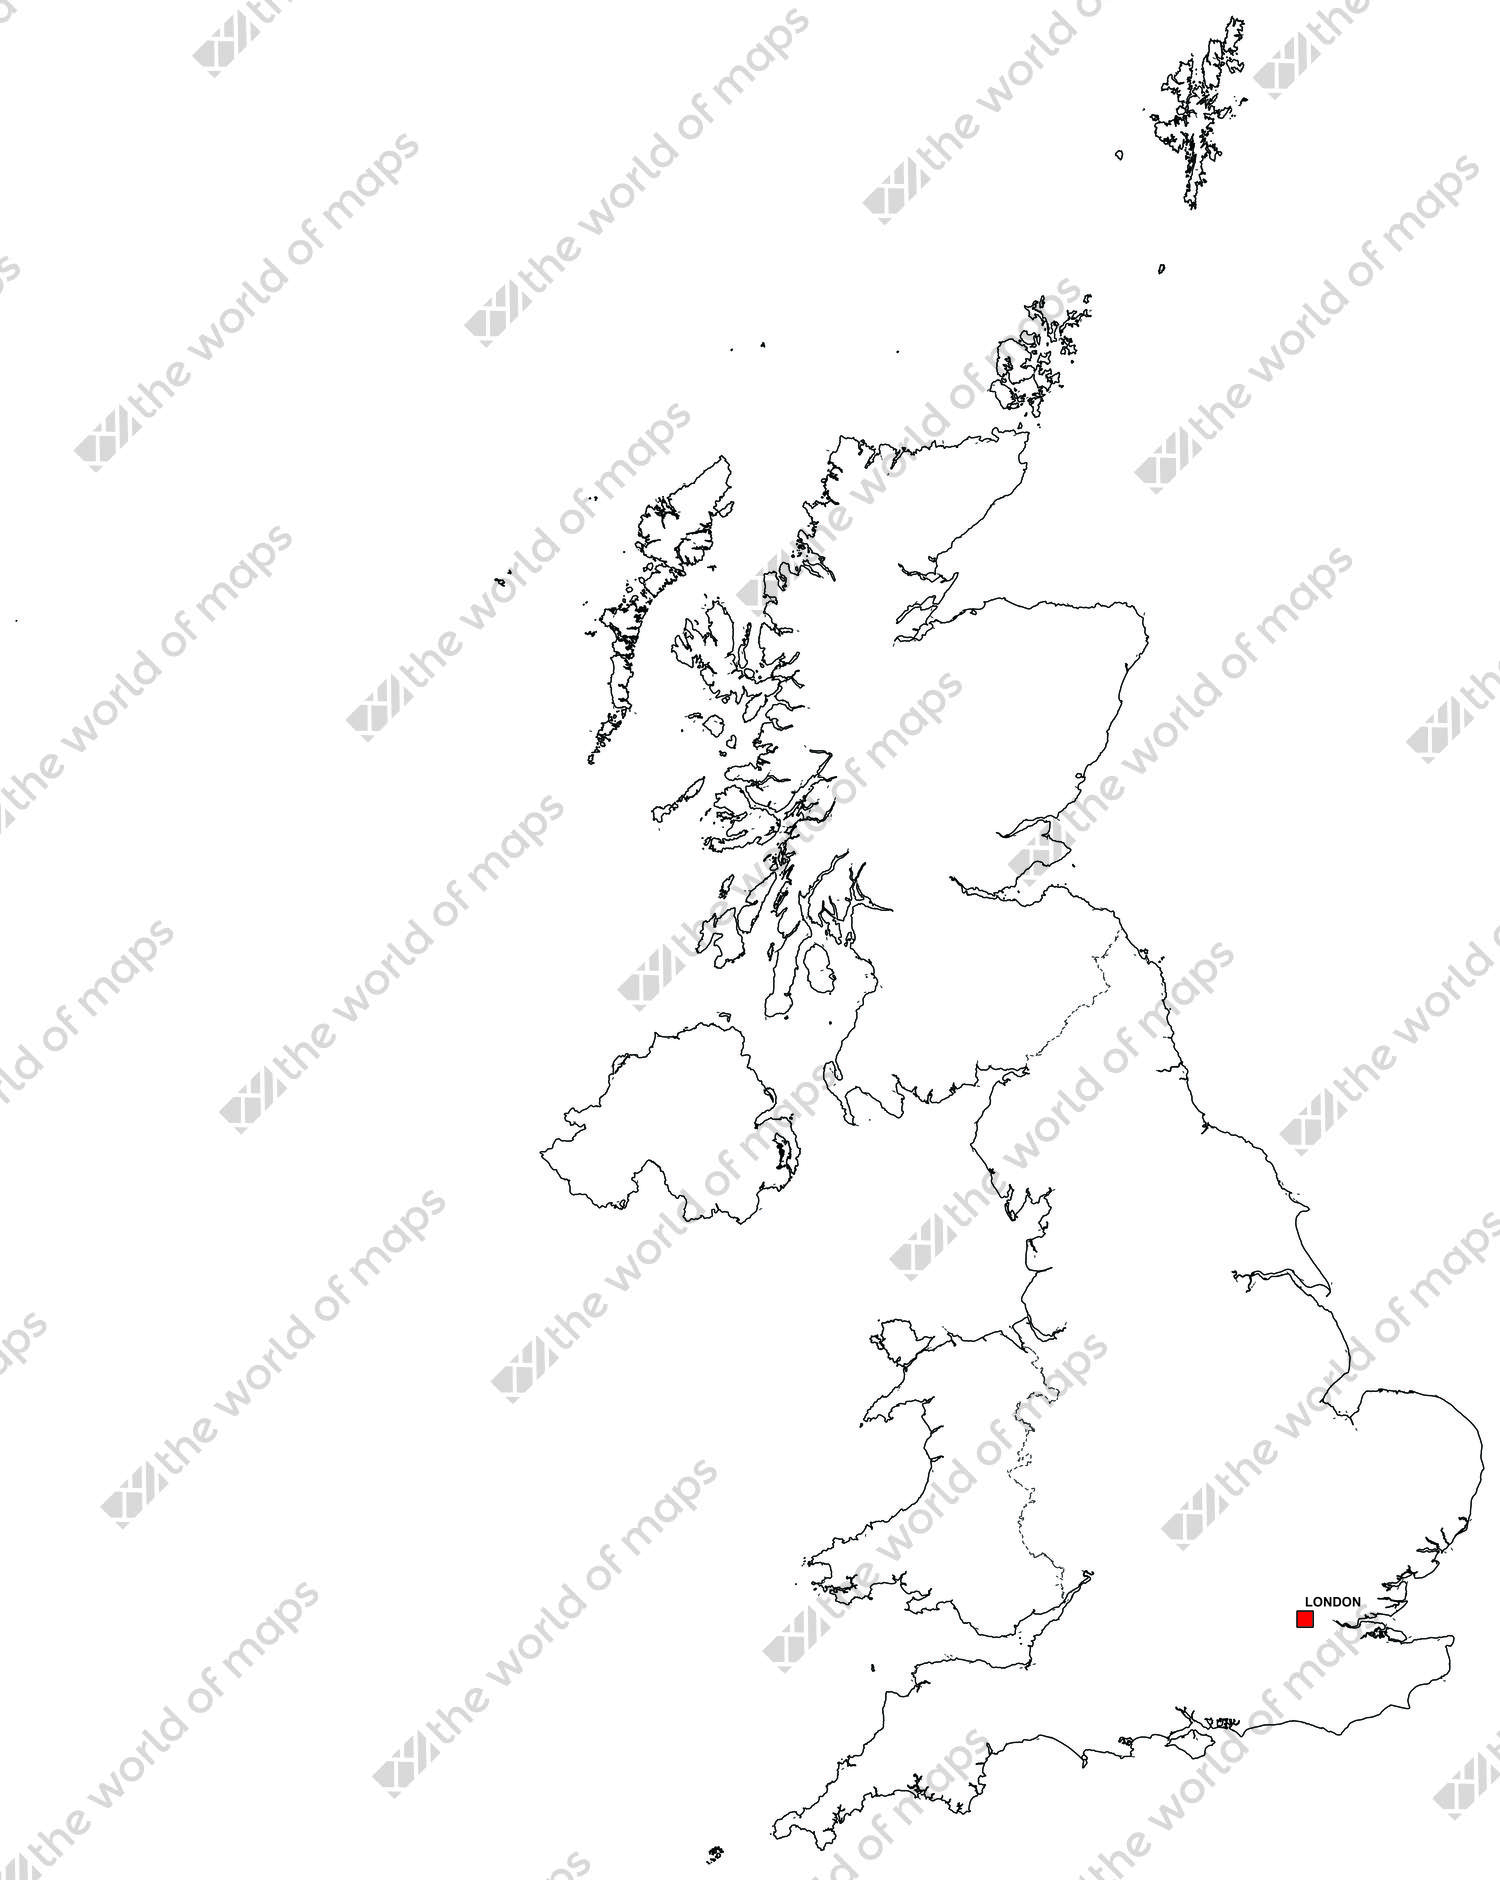 Digital map of the United Kingdom (free)